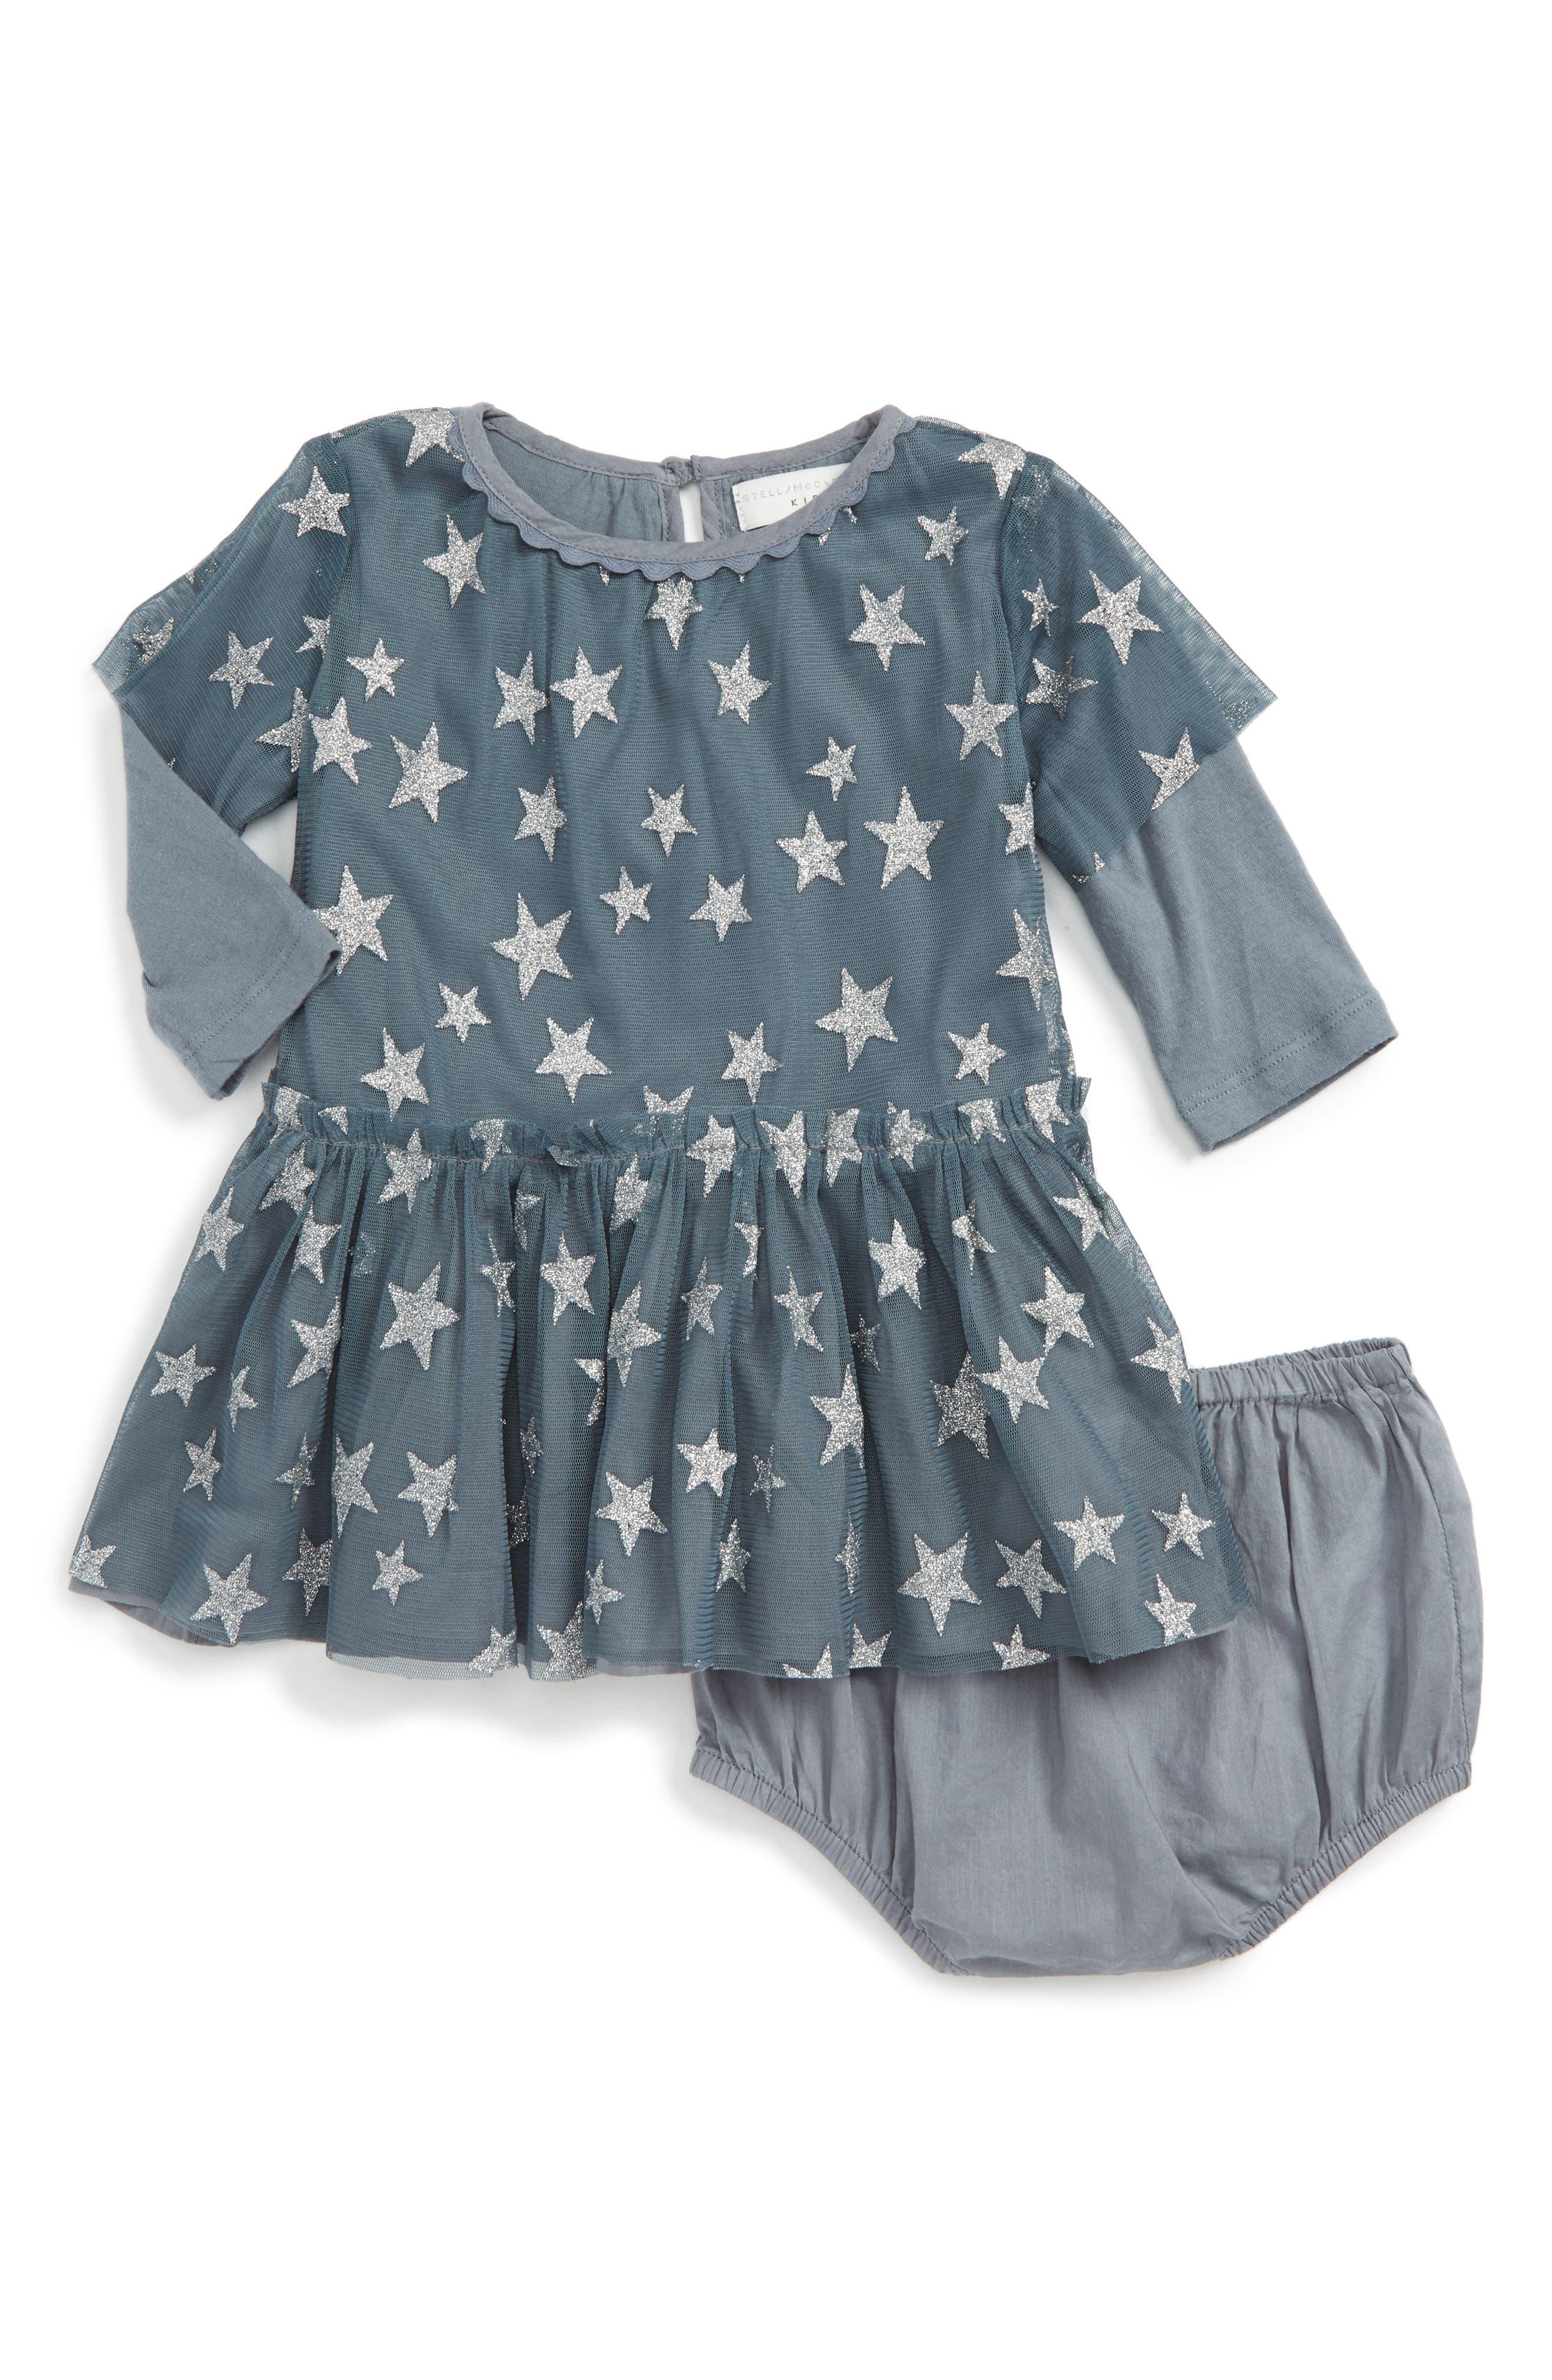 Main Image - Stella McCartney Kids Tulle Star Dress (Baby Girls)